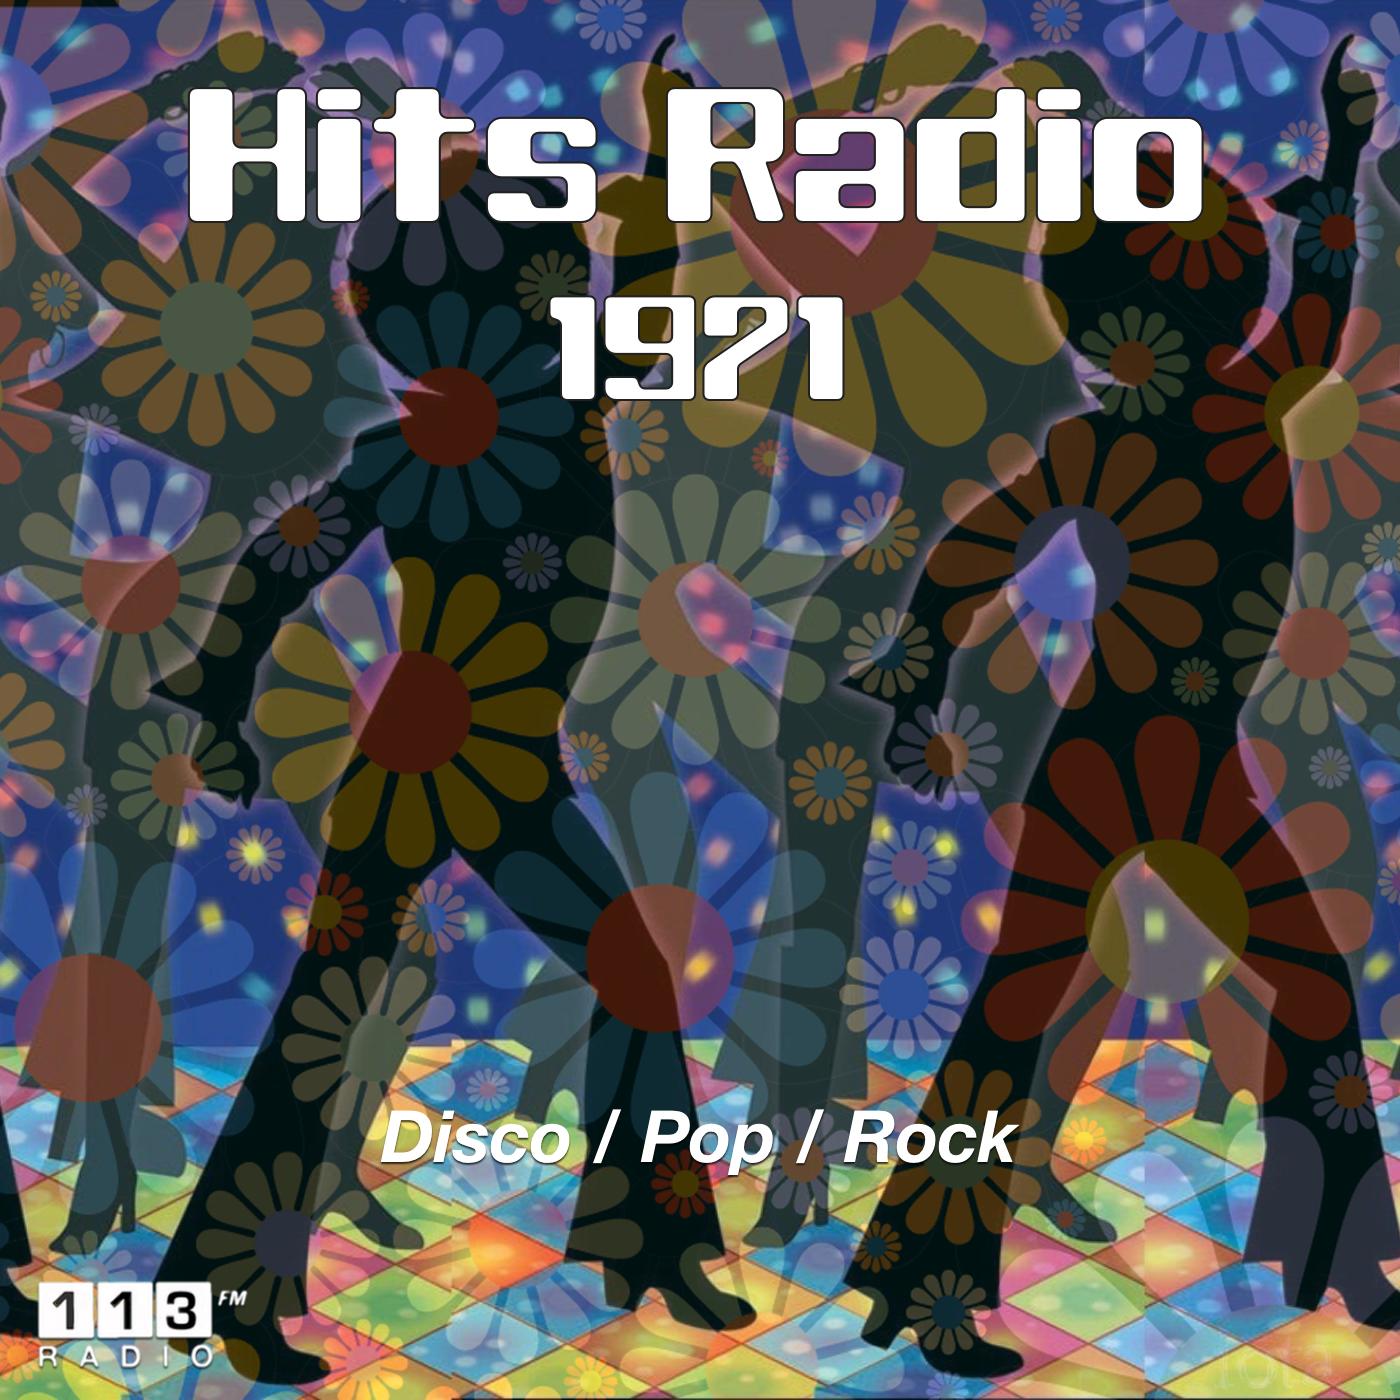 113.fm Hits Radio - 1971